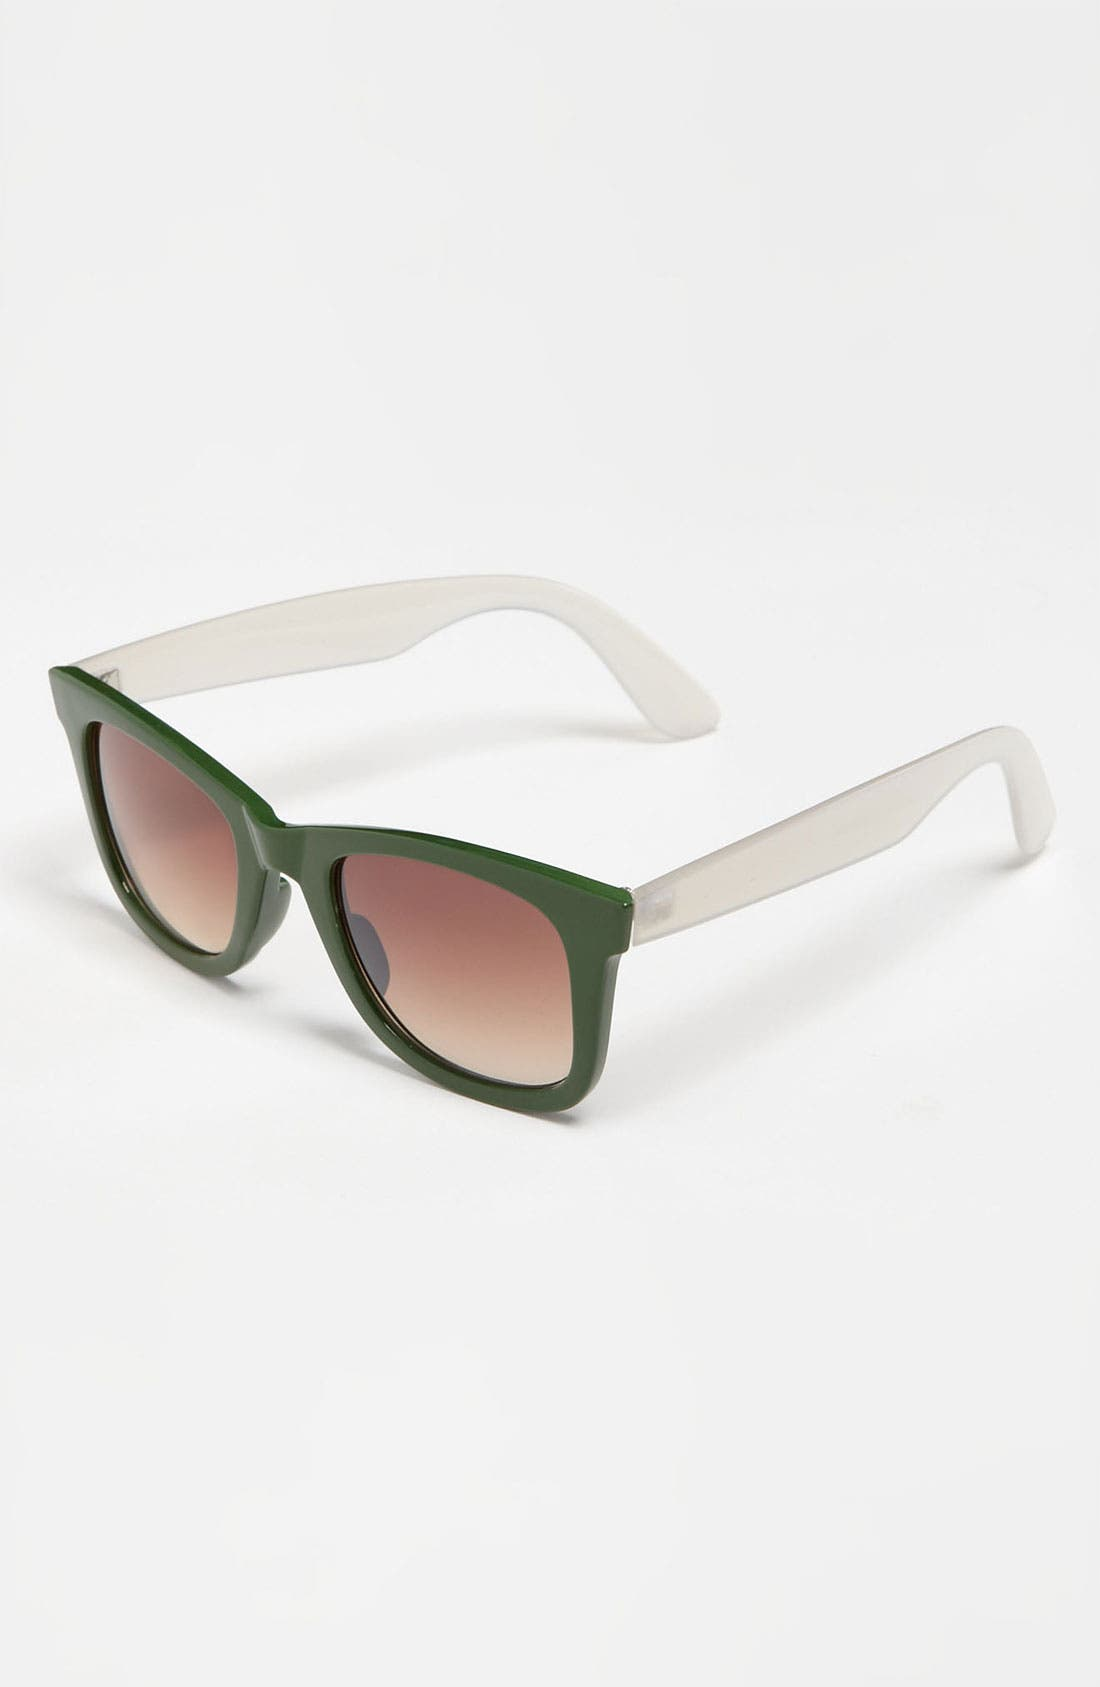 Alternate Image 1 Selected - Icon Eyewear 'Hank' Color Changing Sunglasses (Boys)